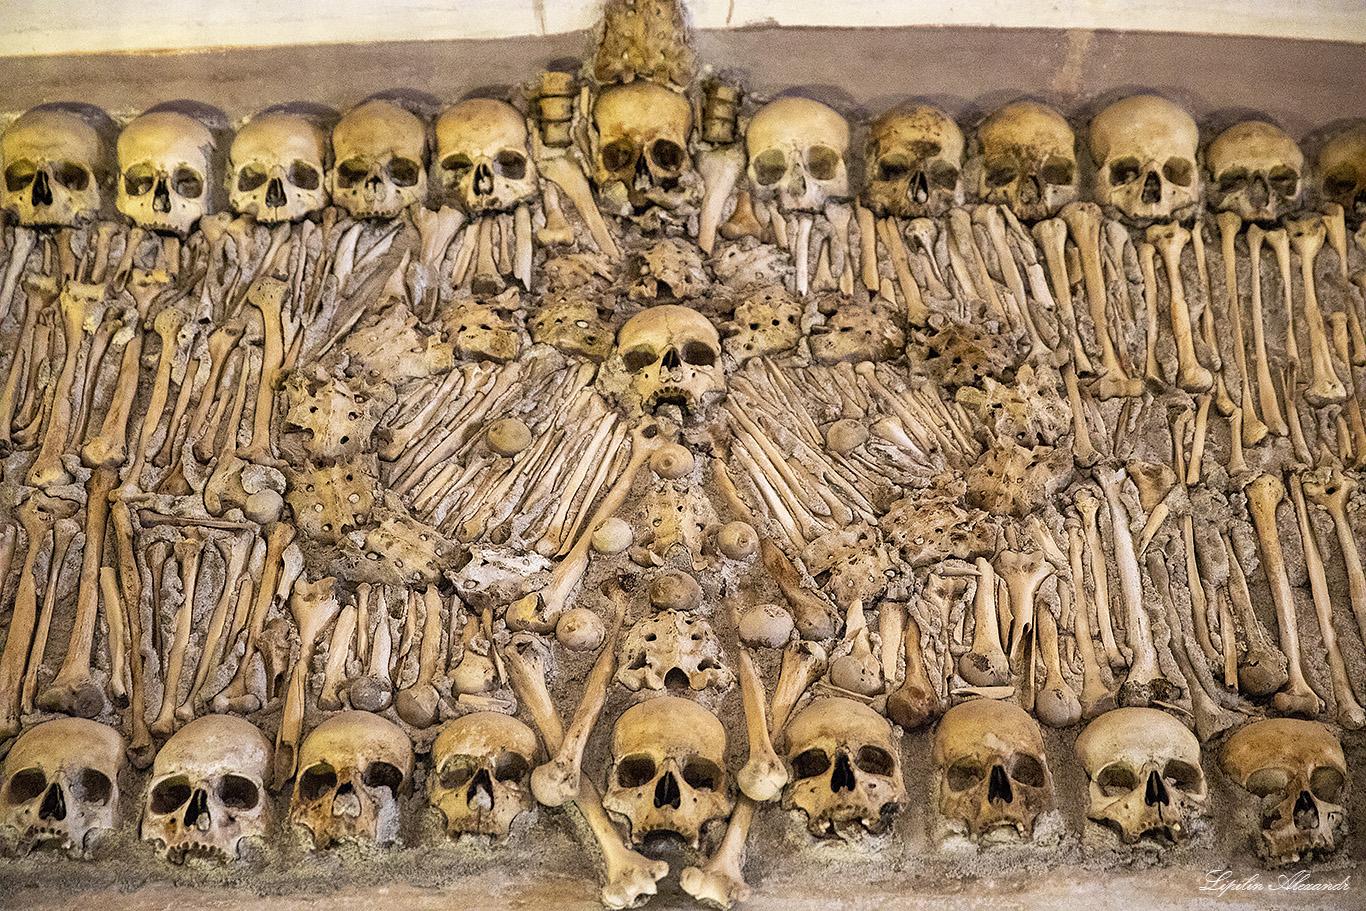 Часовня костей 4